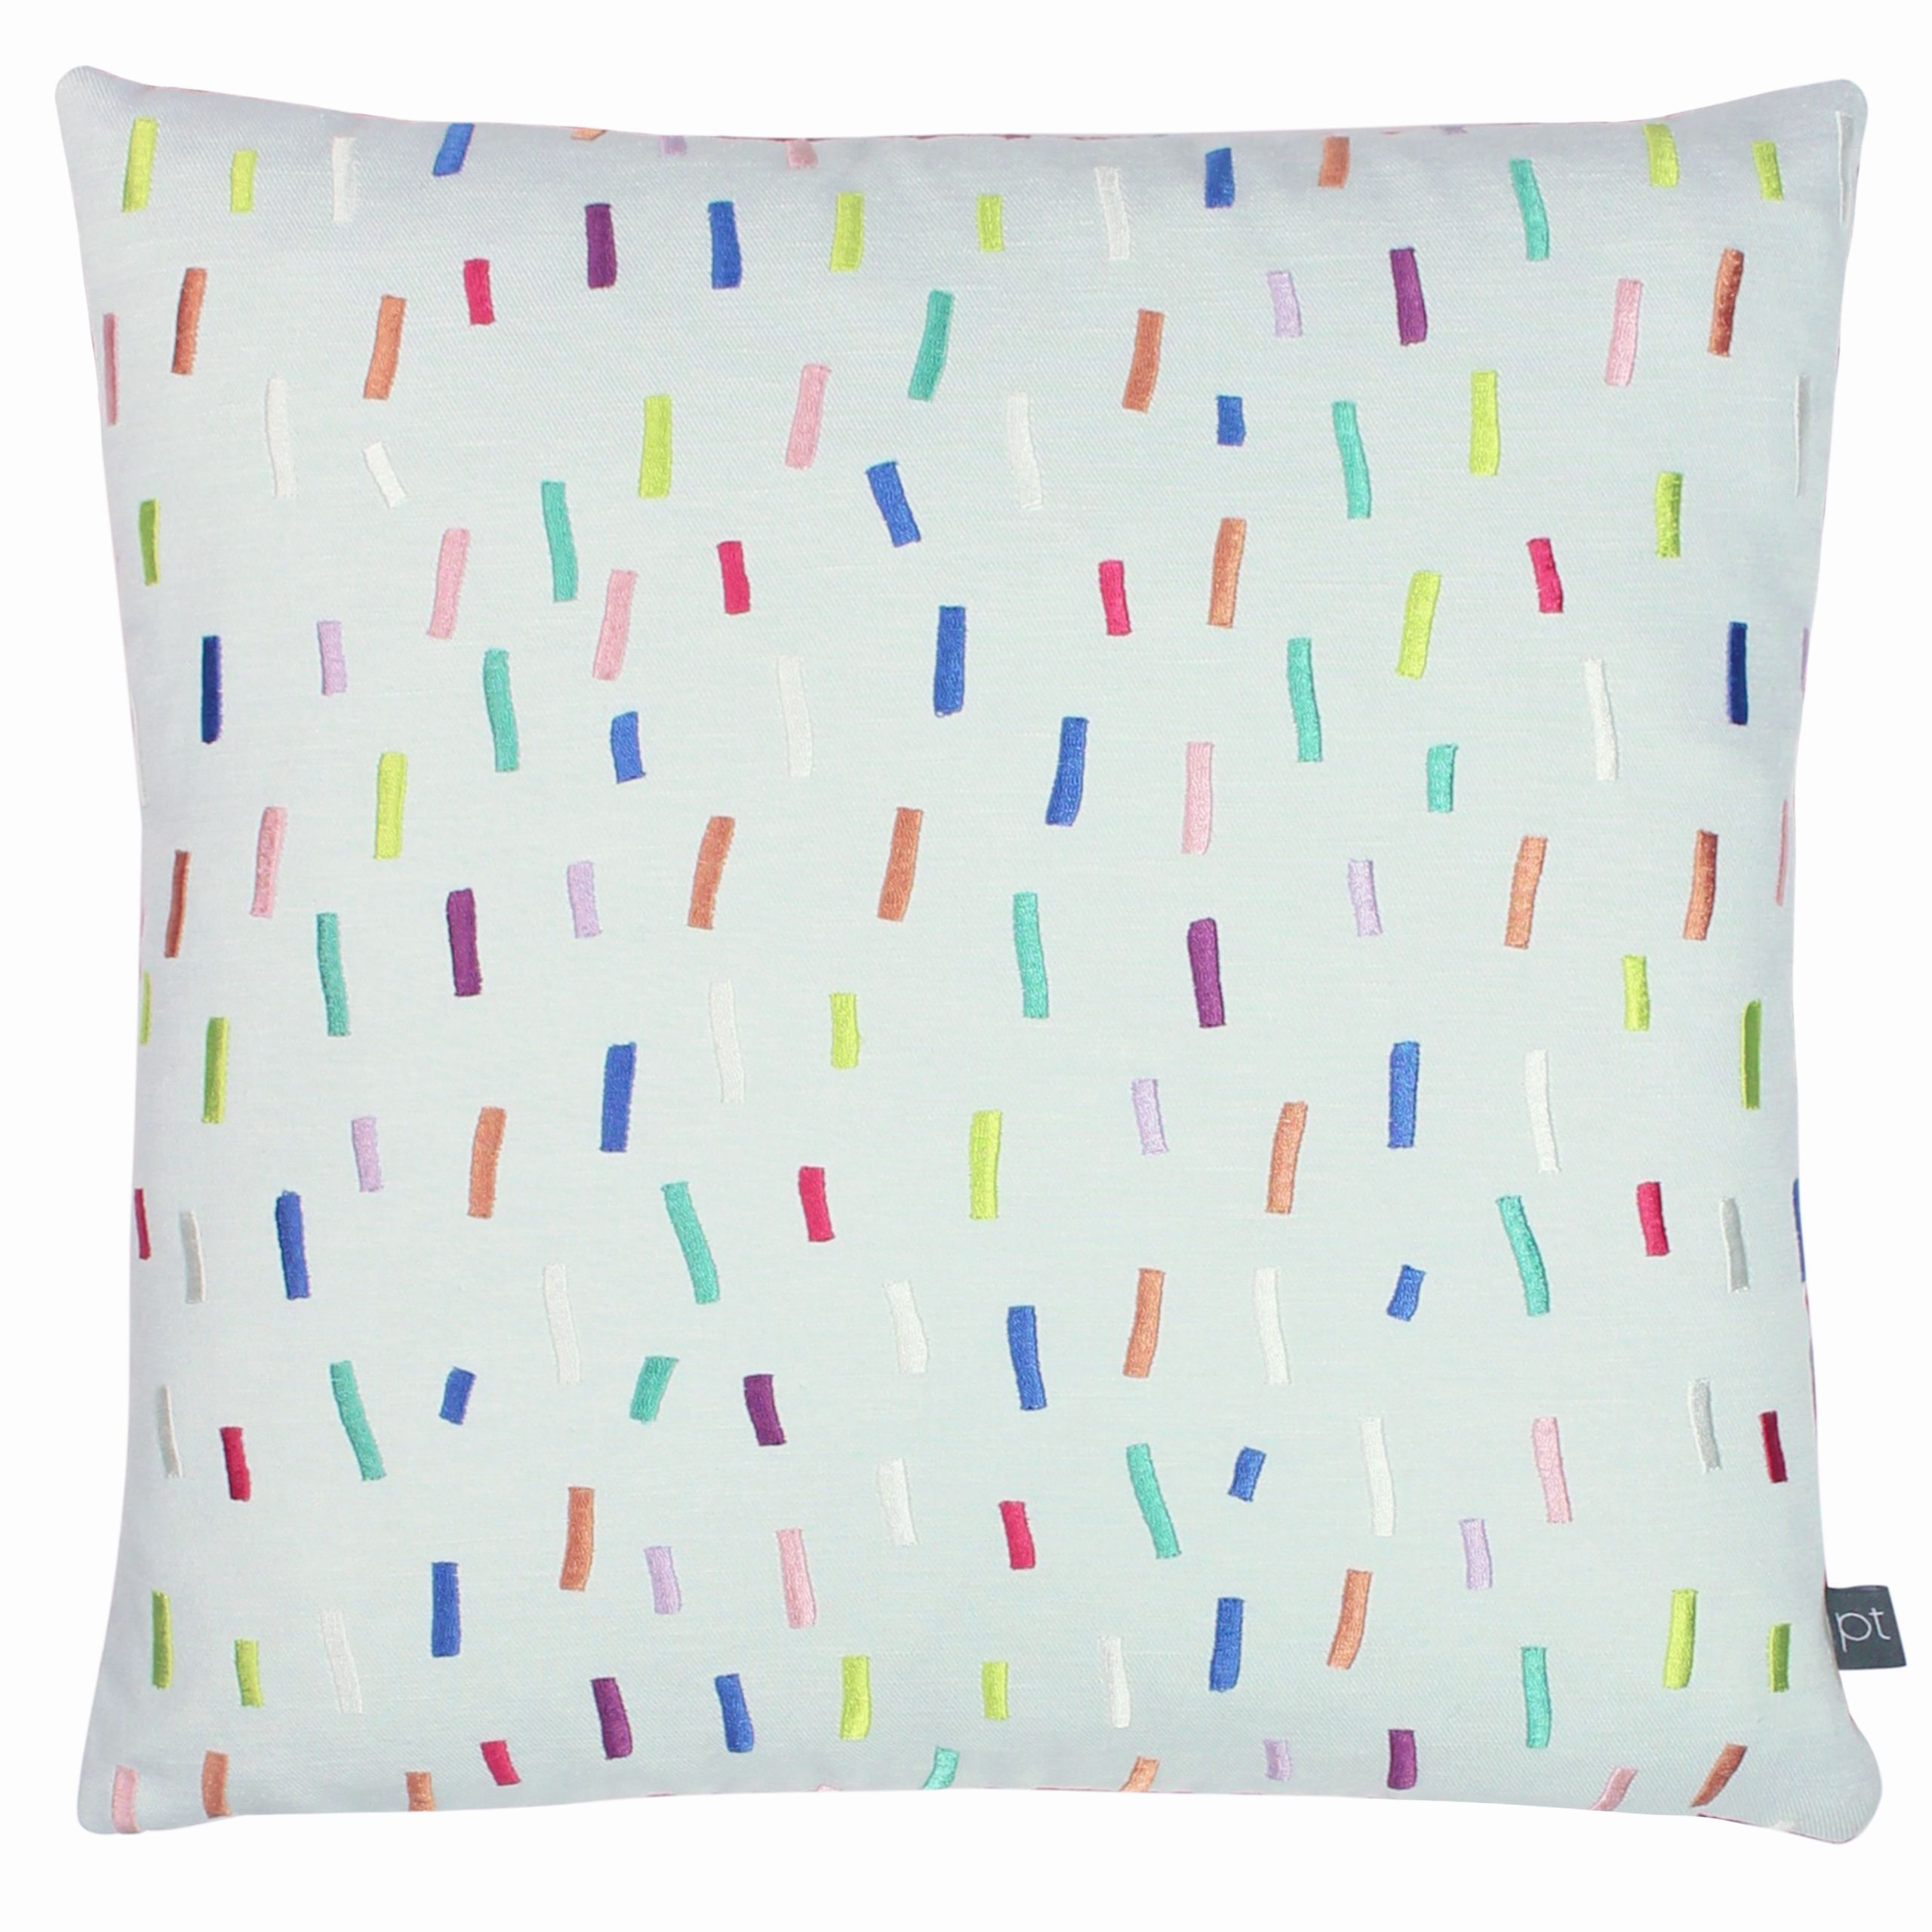 Prestigious Textiles Dolly Mixture Polyester Filled Cushion, Polyester, Cotton, Rainbow